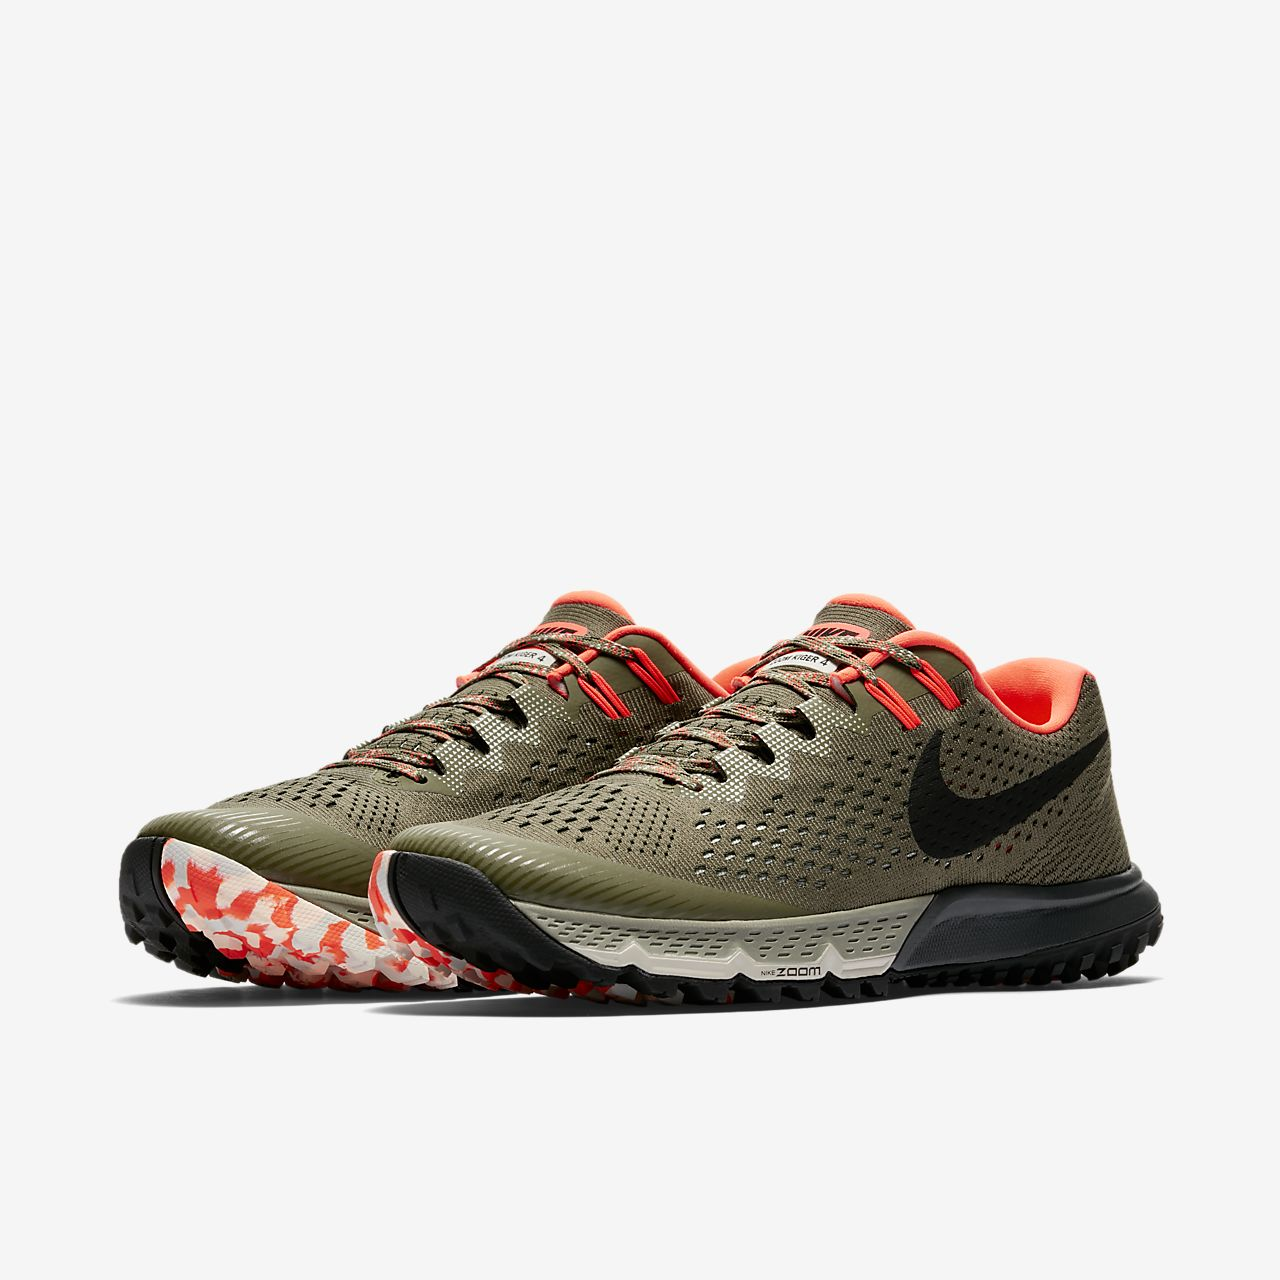 Men's Nike Air Zoom Terra Kiger 3 Size 10 Total Crimson / Black  Training Shoes